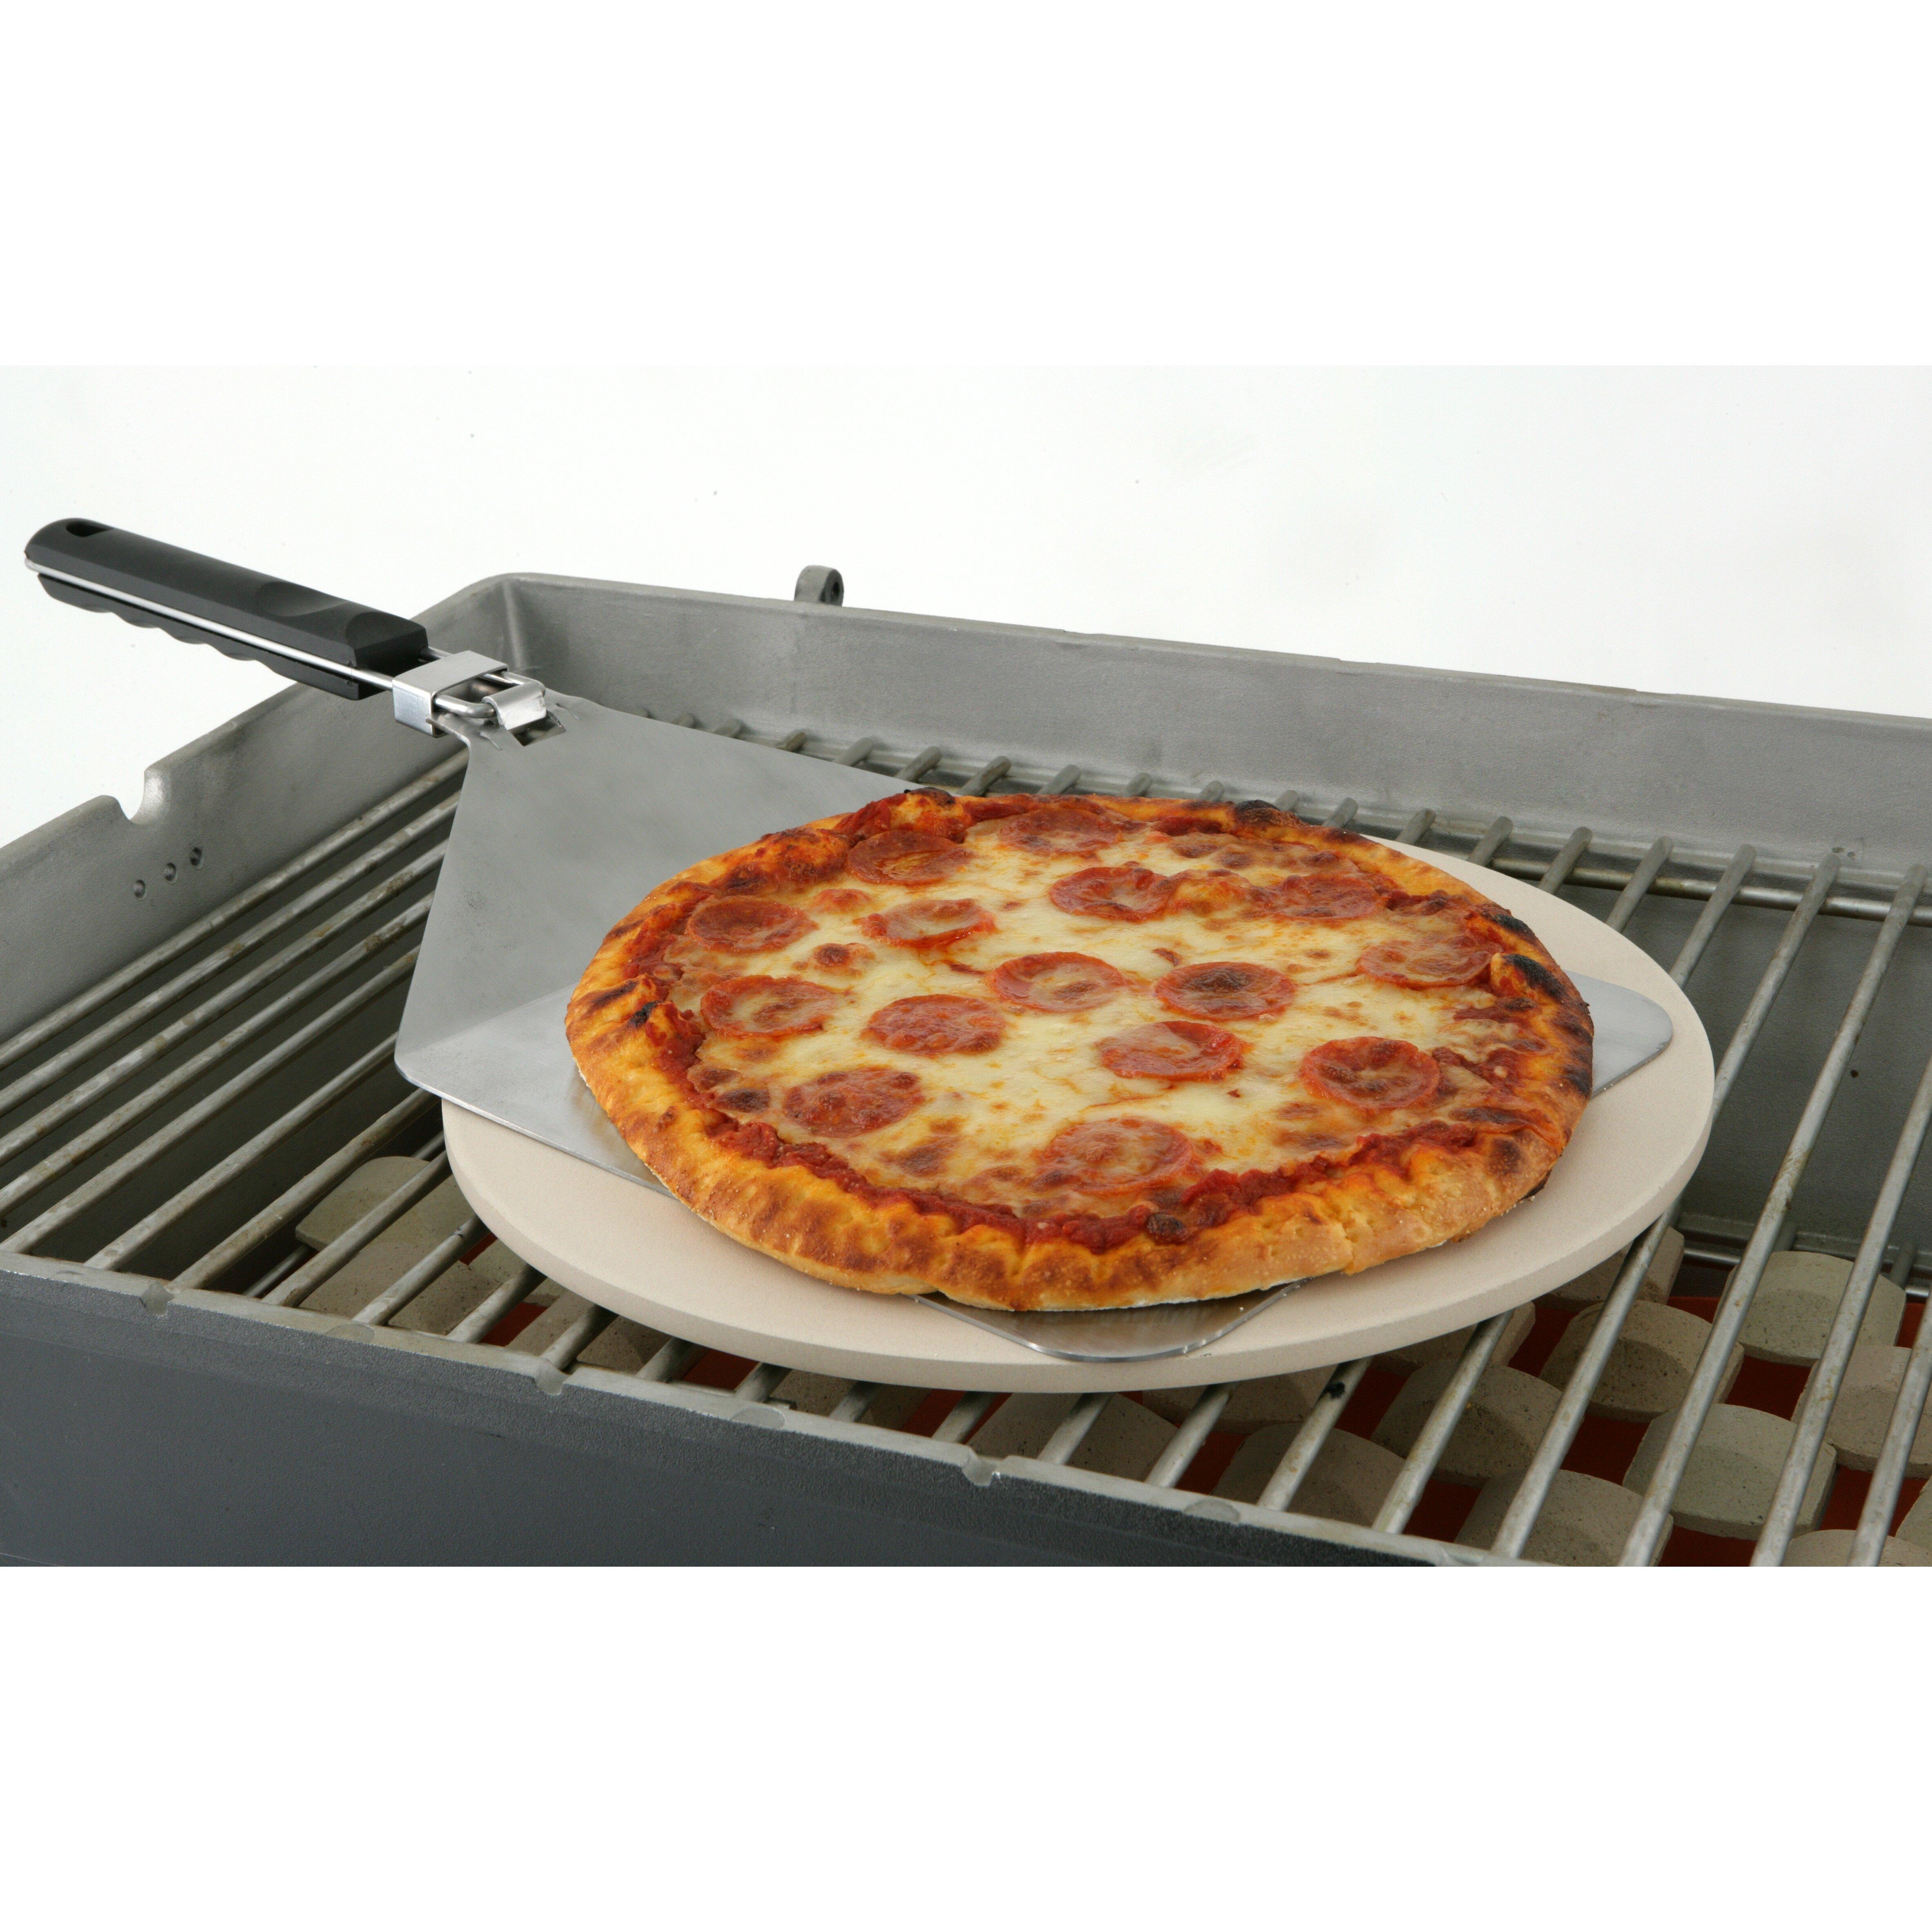 Discounts For California Pizza Kitchen